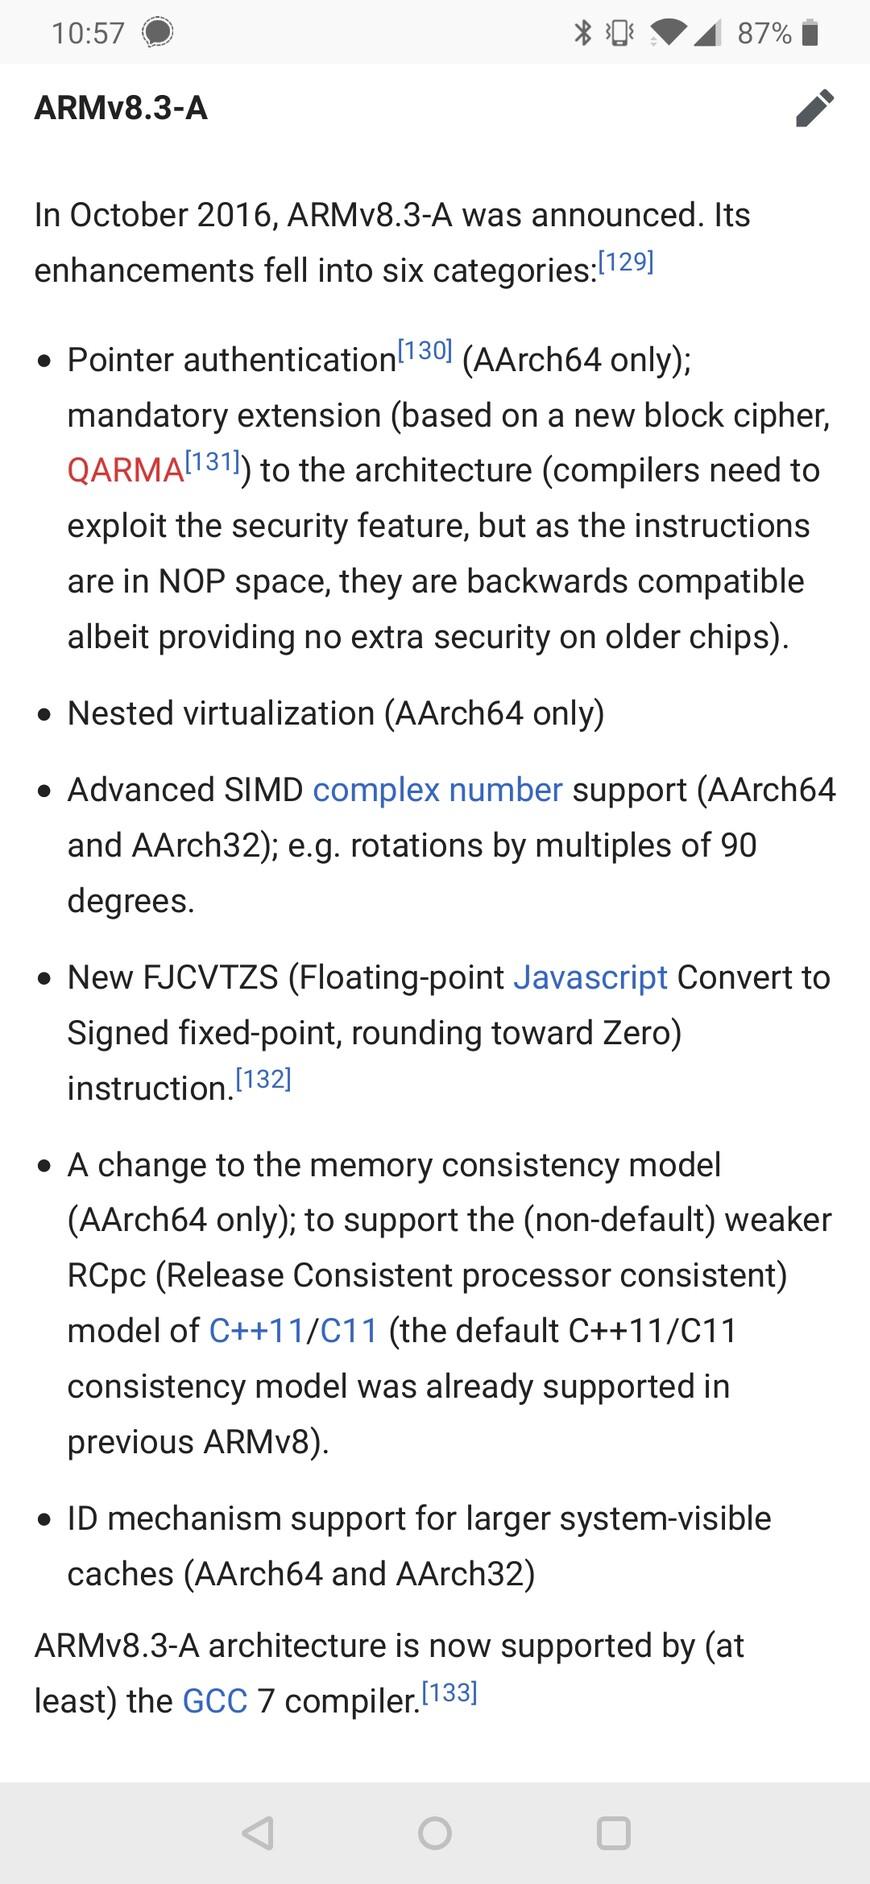 FJCVTZS (Floating-point Javascript Convert to Signed fixed-point, rounding toward Zero) instruction